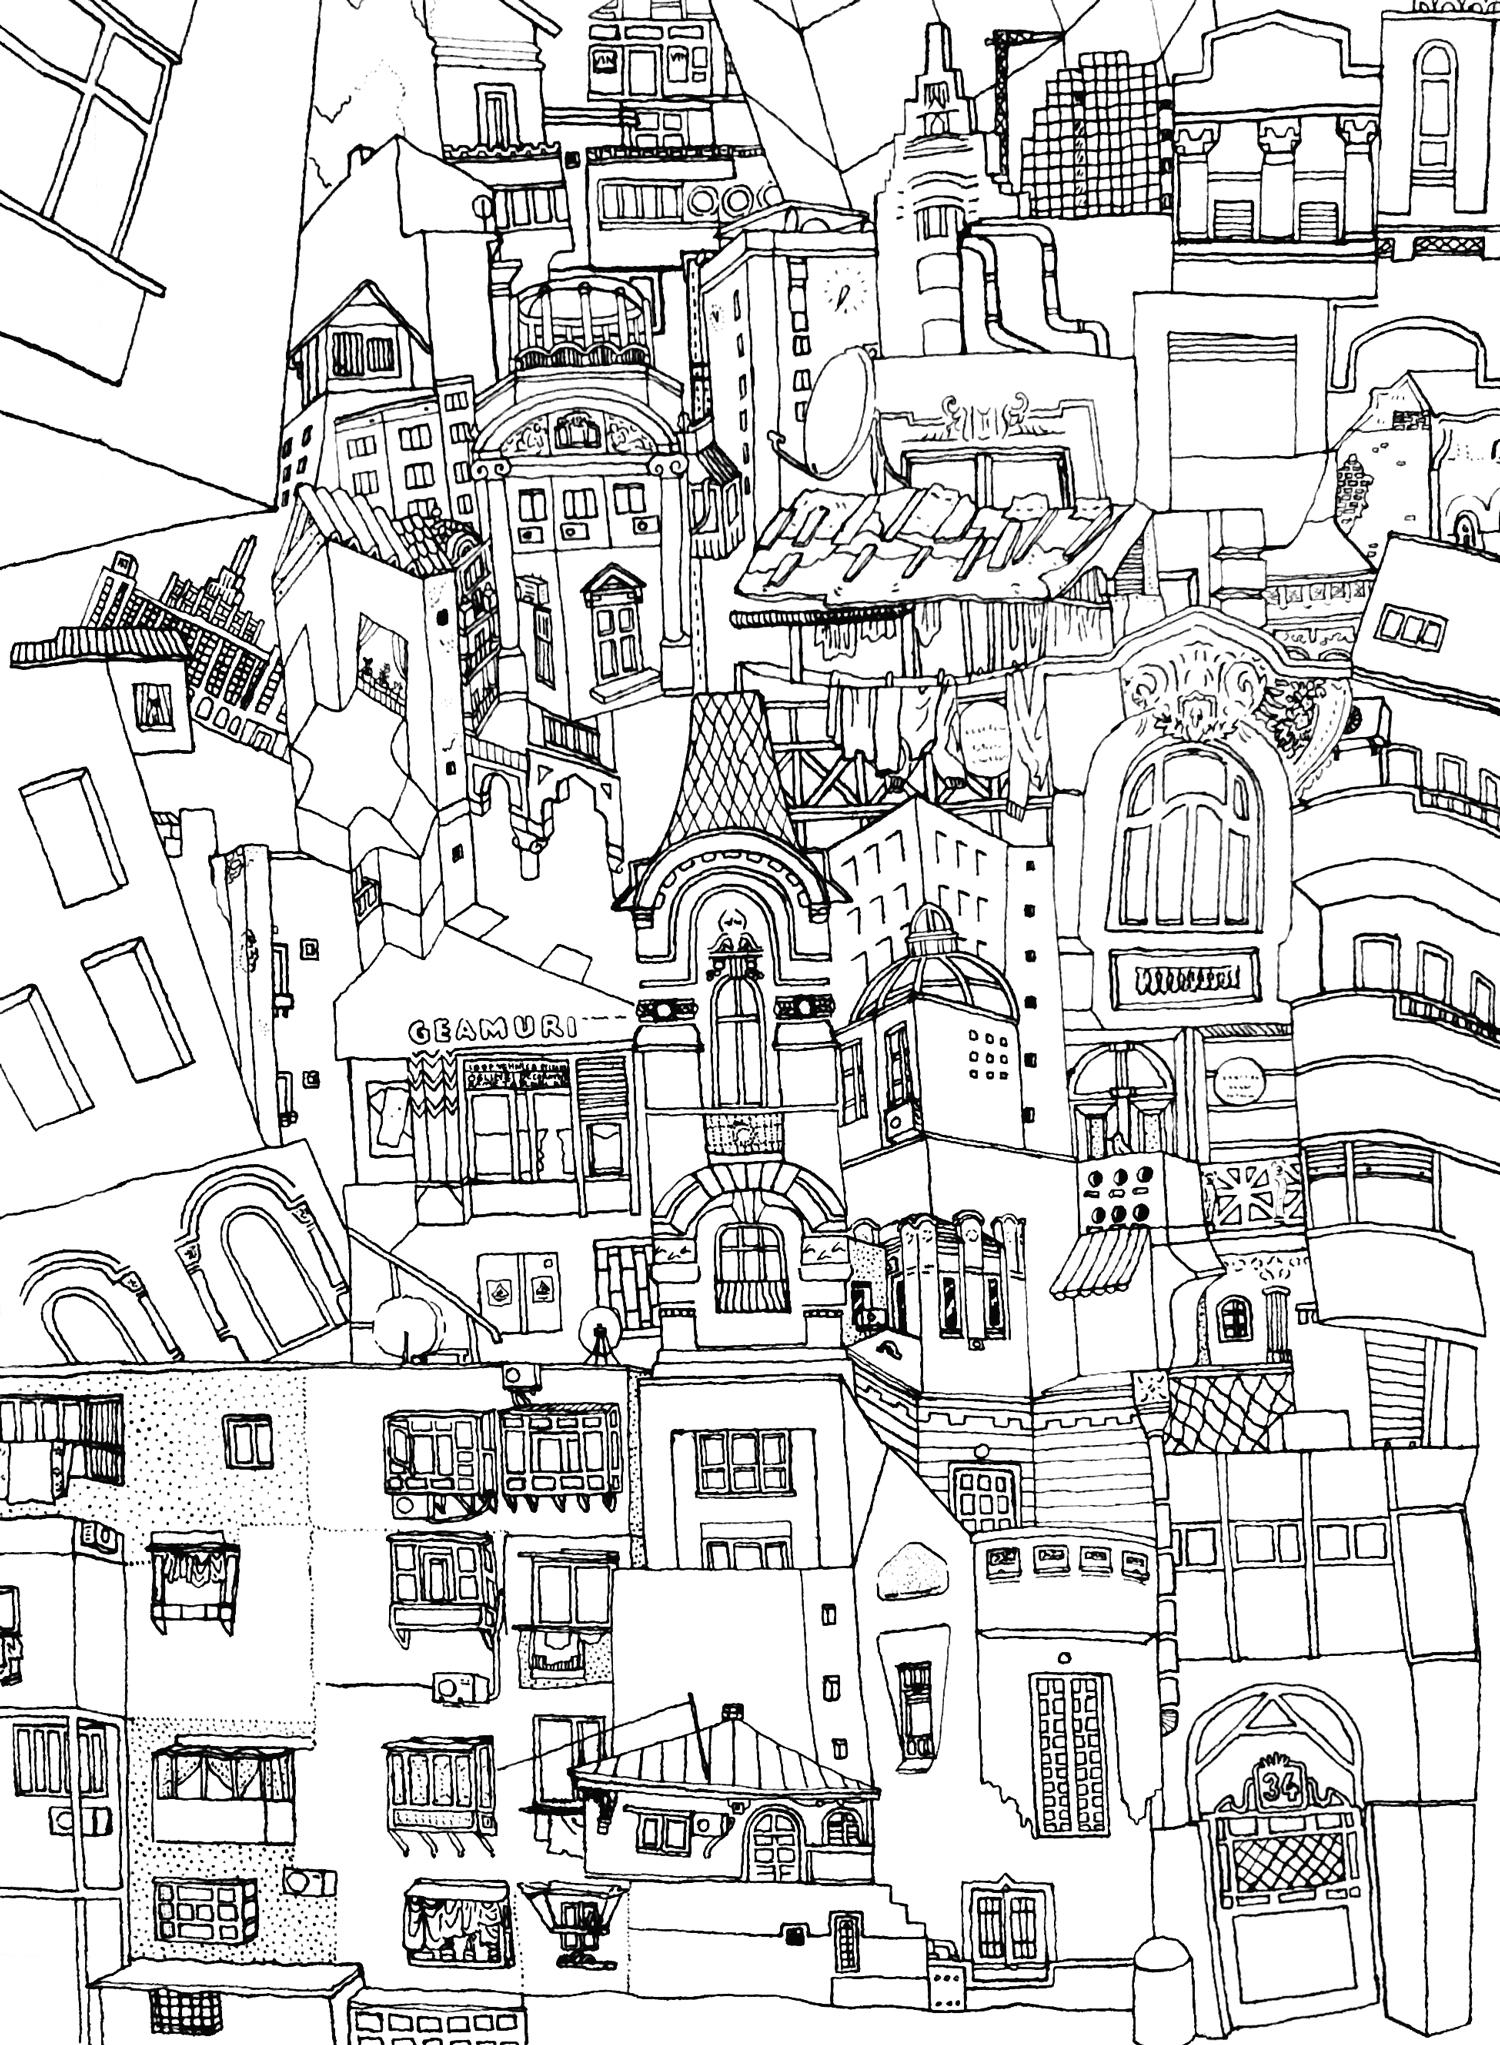 Earthquake in the Vulnerable City – DoR (Decât o Revistă)